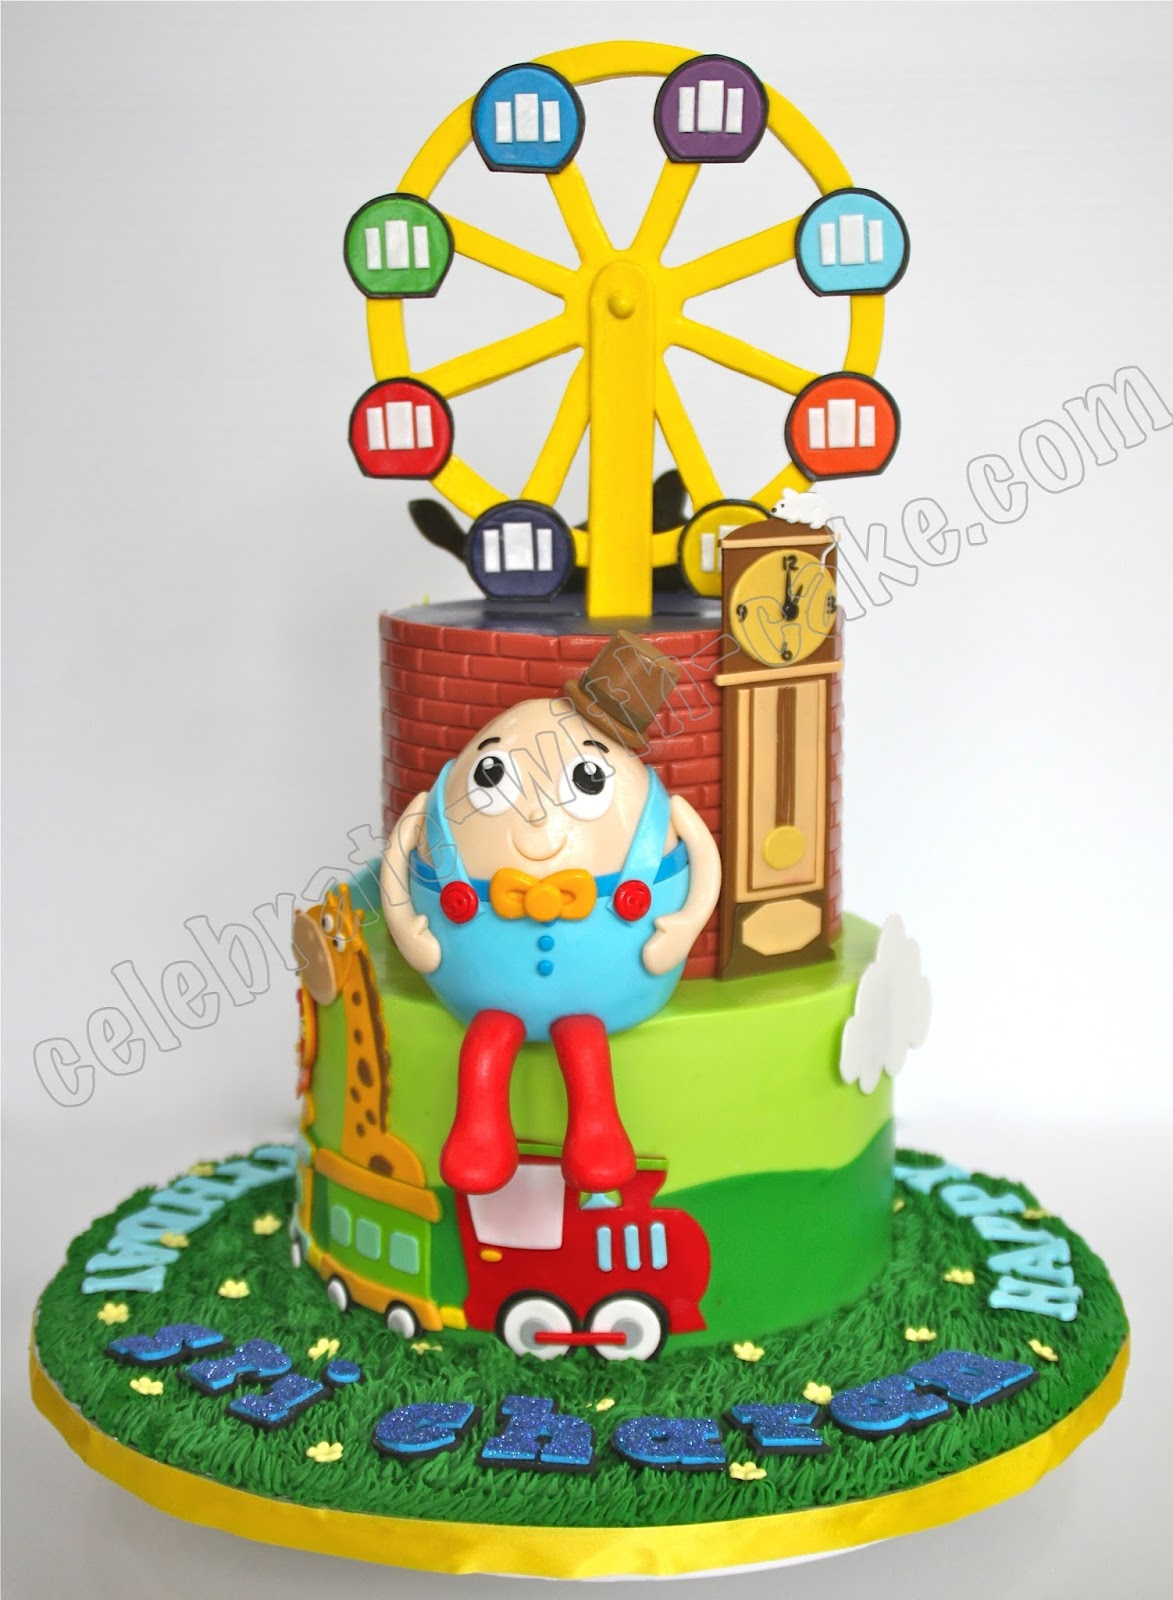 Celebrate With Cake Humpty Dumpty Ferris Wheel Animal Cake